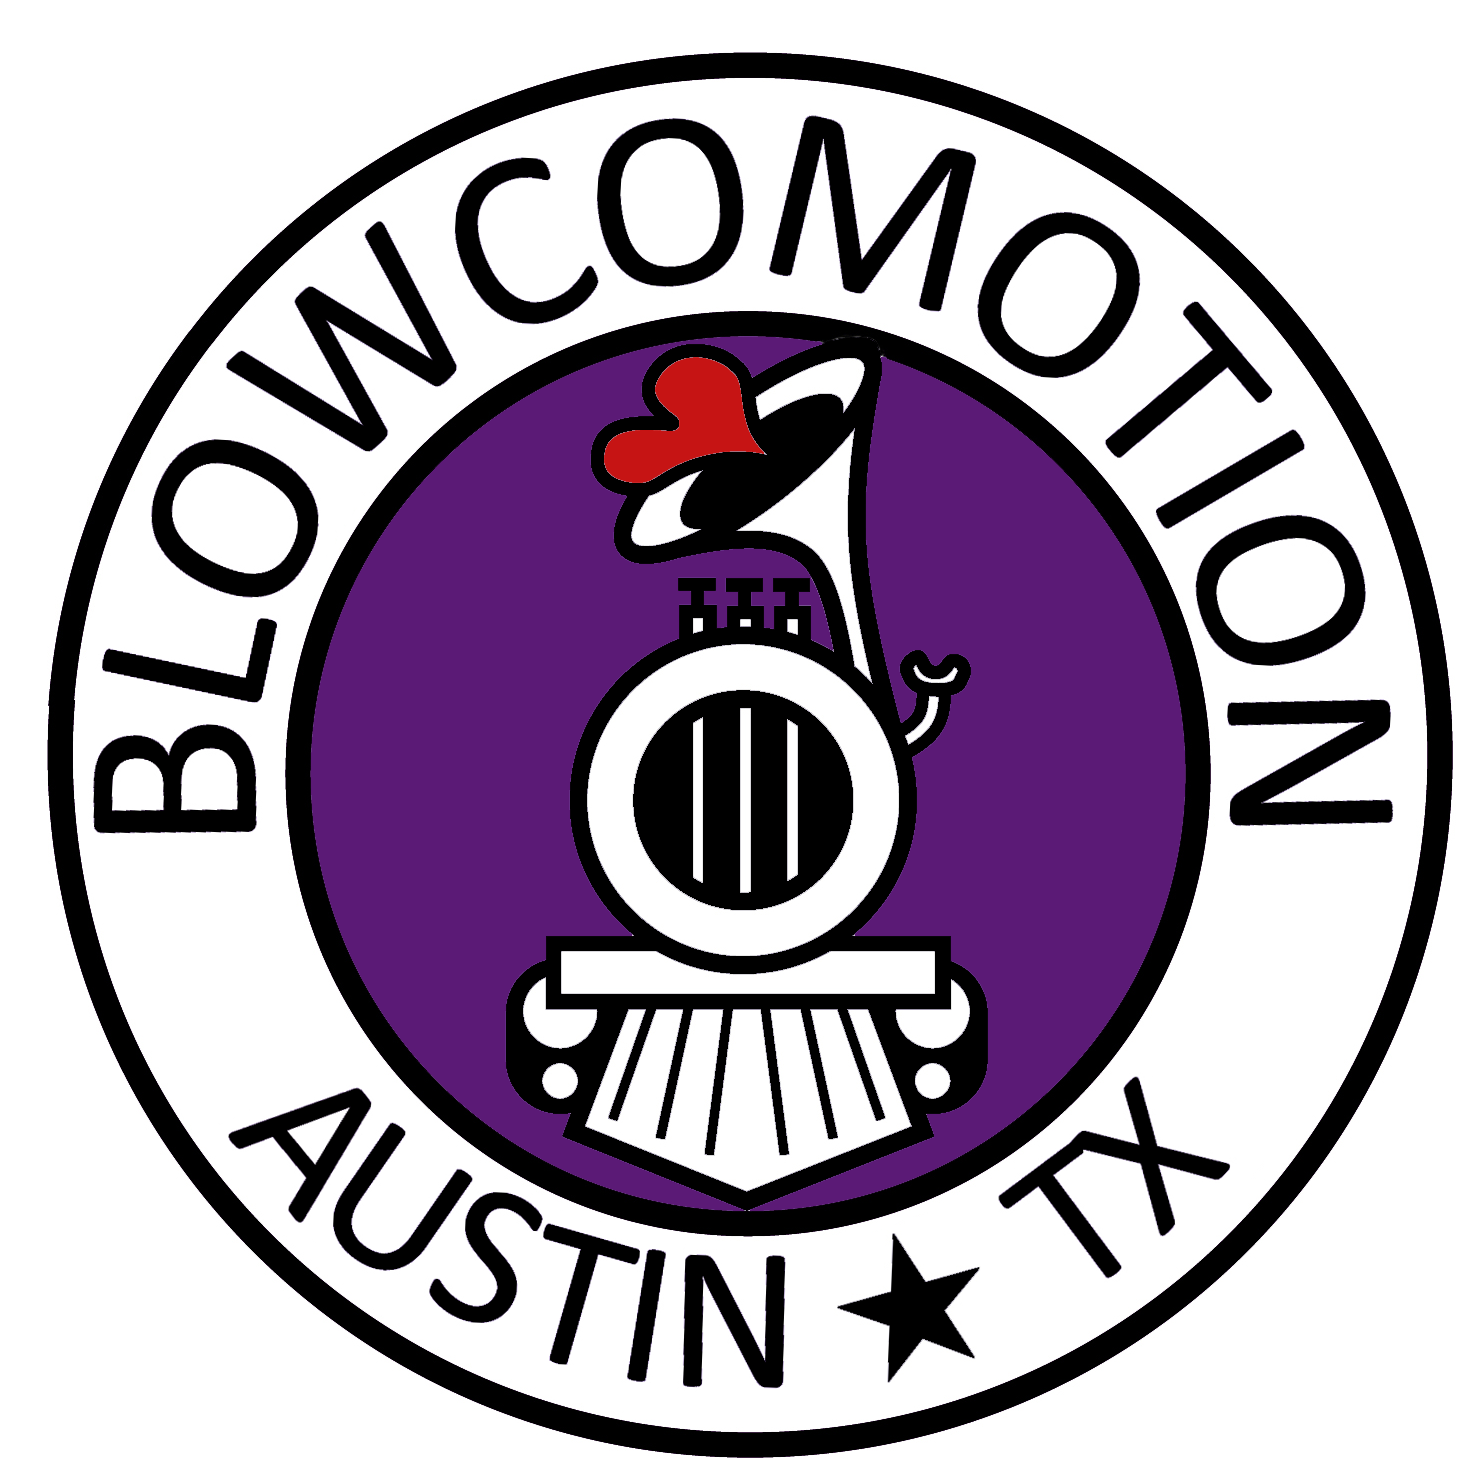 Blowcomotion